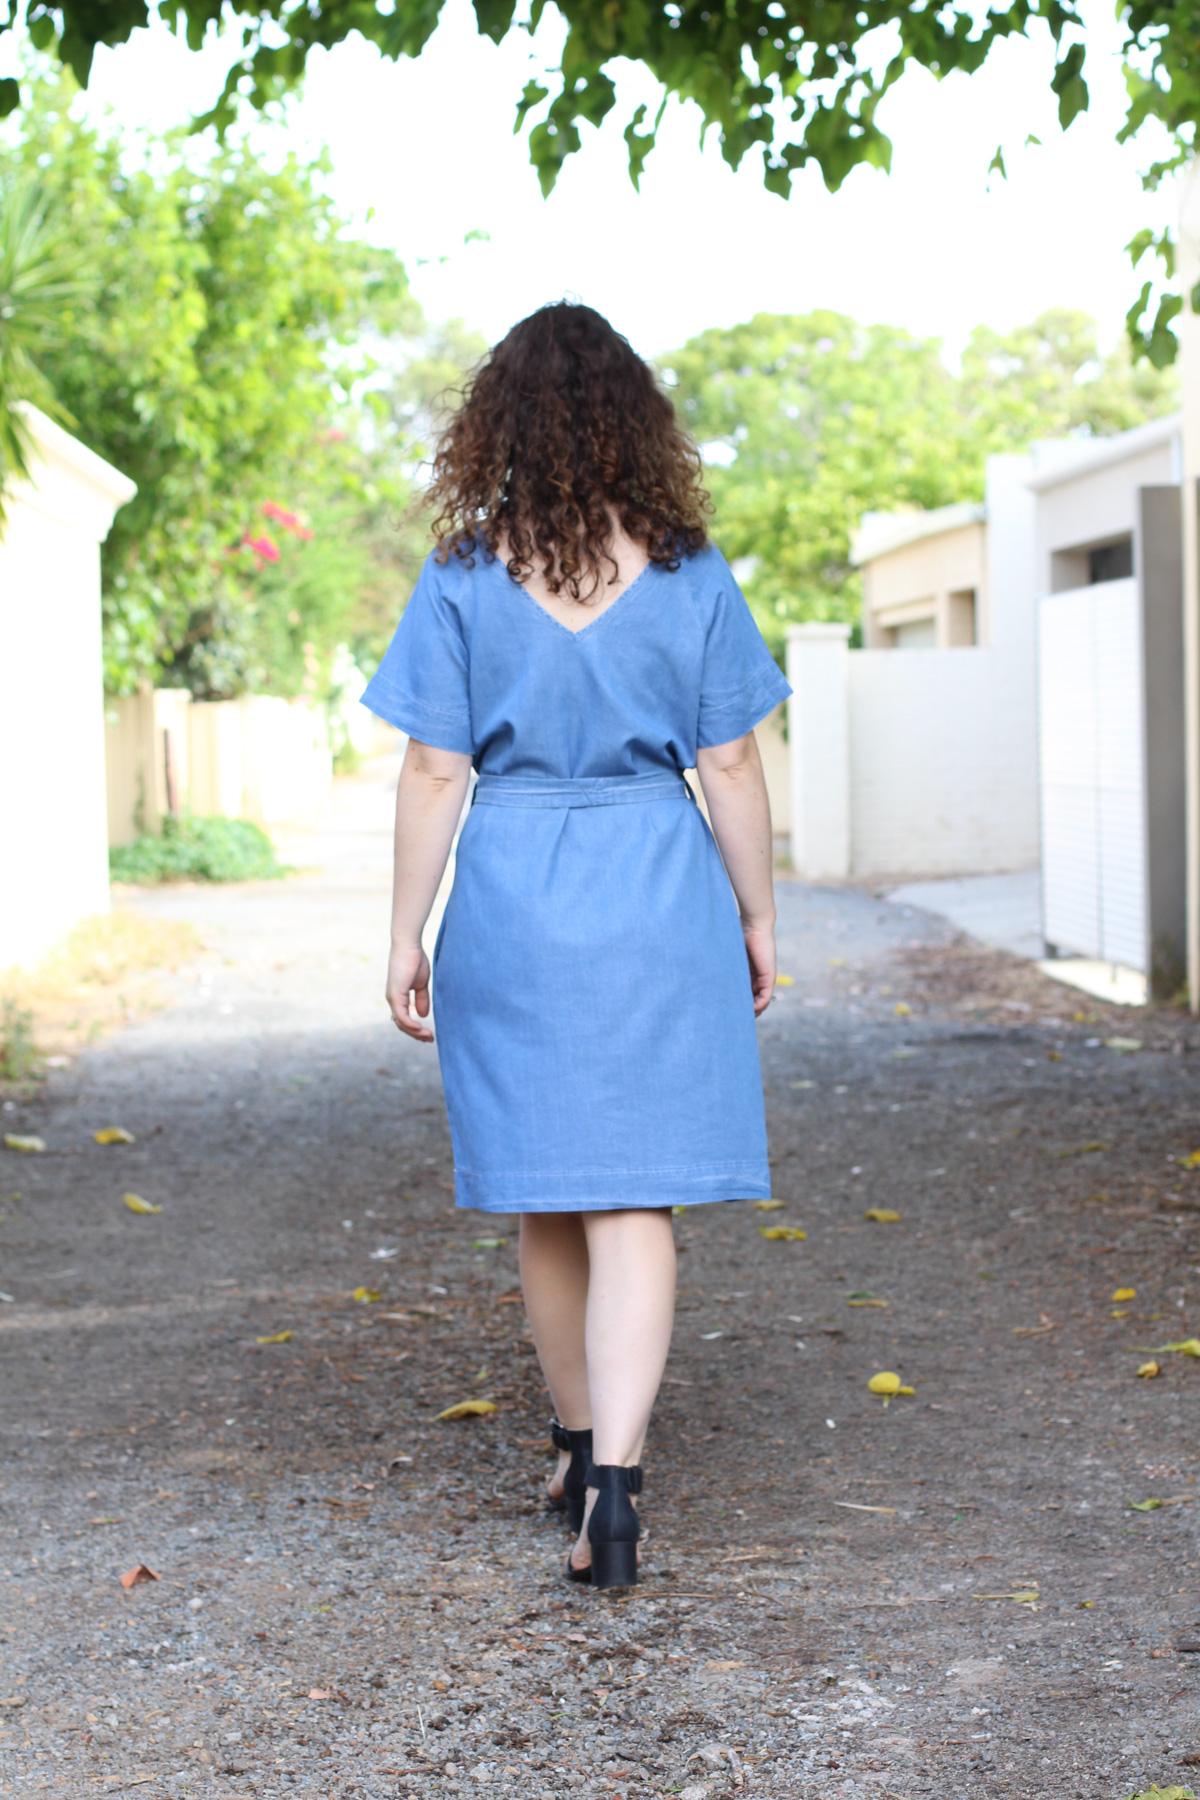 Megan Nielsen River dress from Spotlight tencel fabric // Megan Nielsen Design Diary